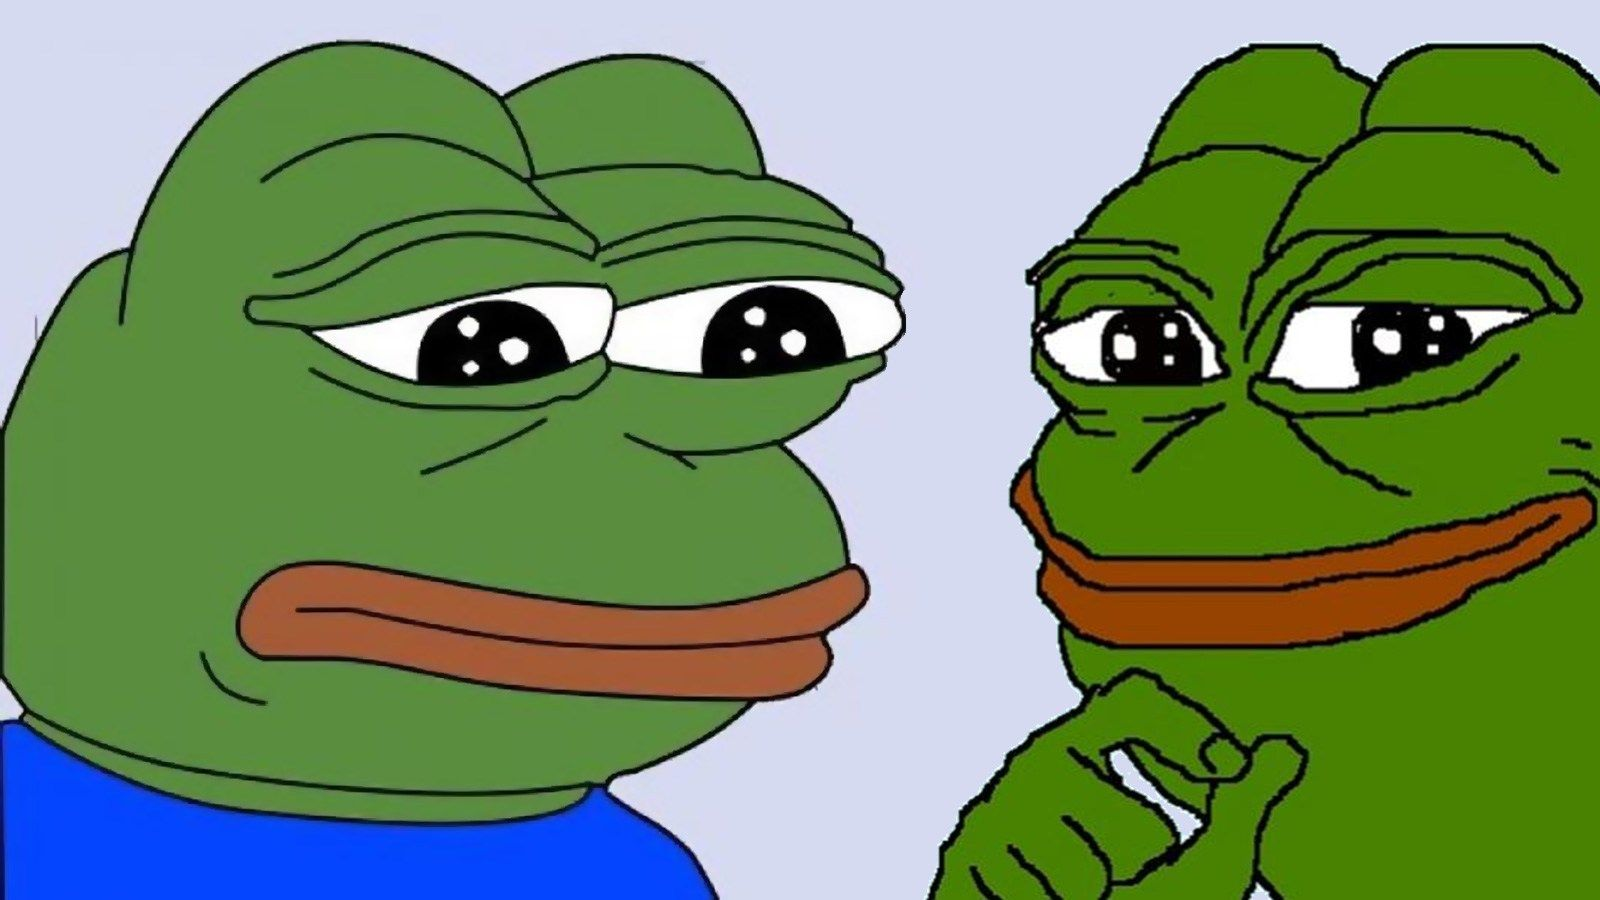 pepe_the_frog_0928